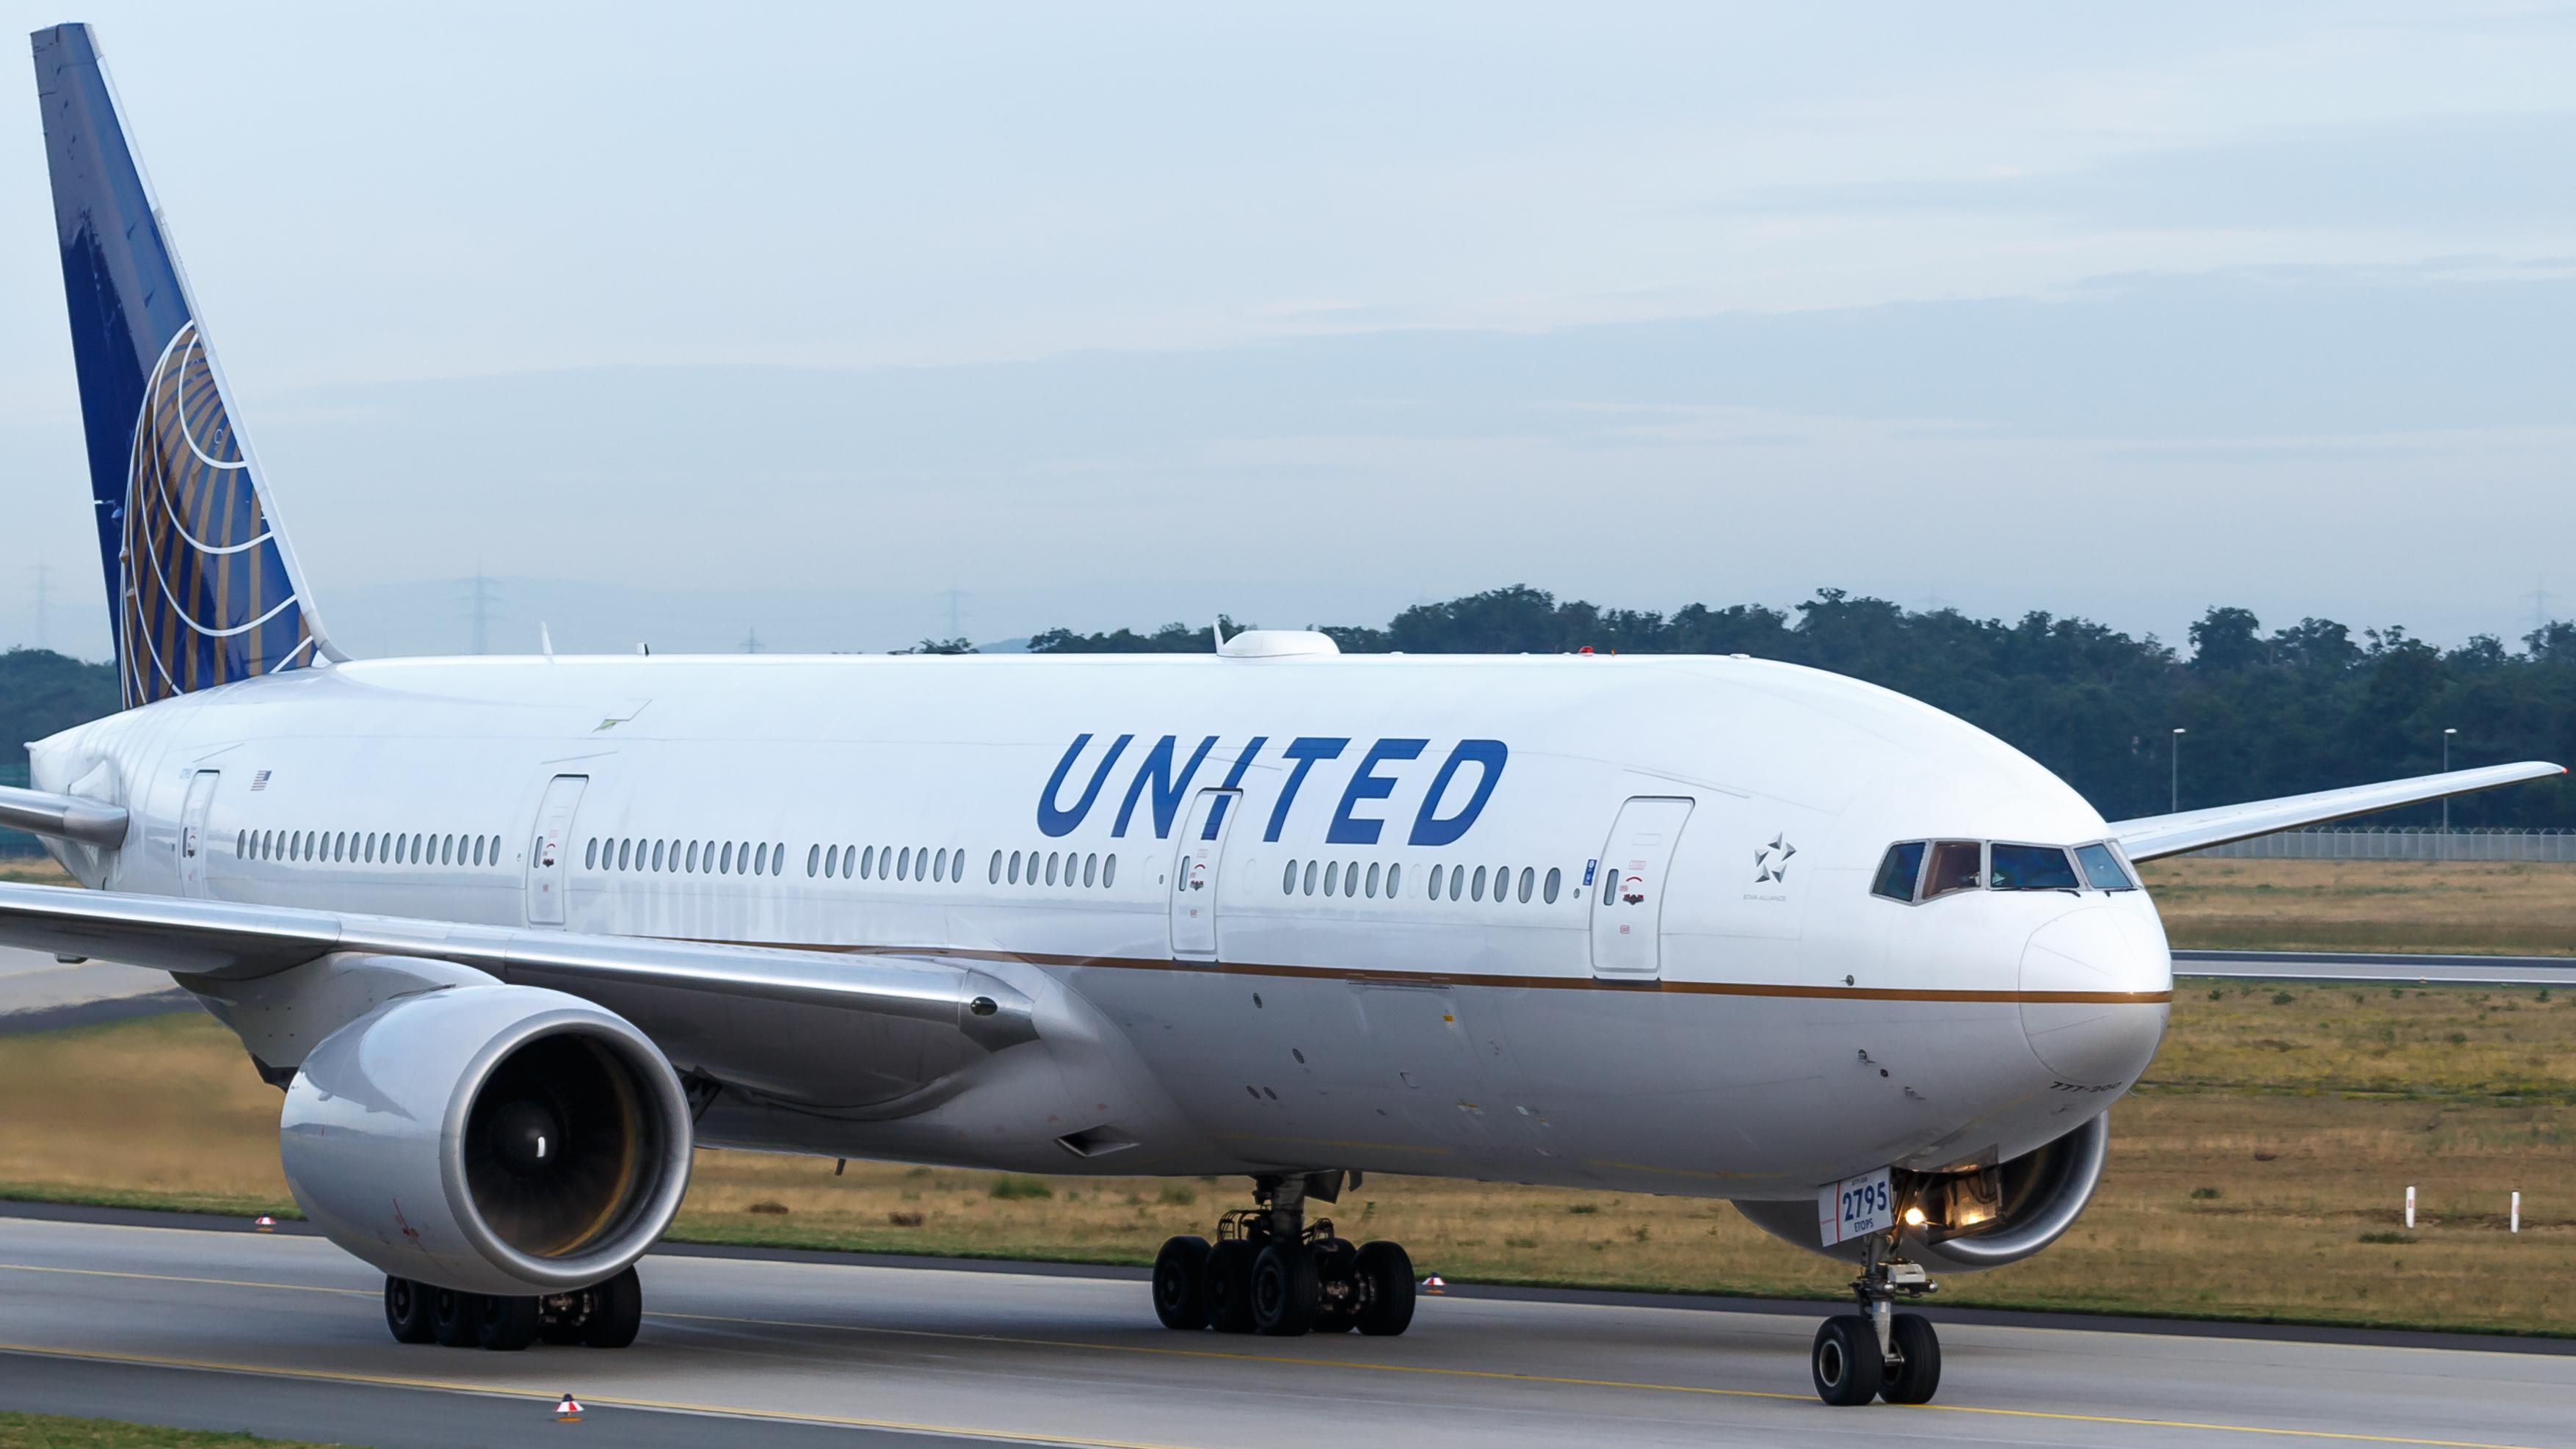 File:United Airlines Boeing 777-200ER (N795UA) at Frankfurt Airport.jpg -  Wikimedia Commons